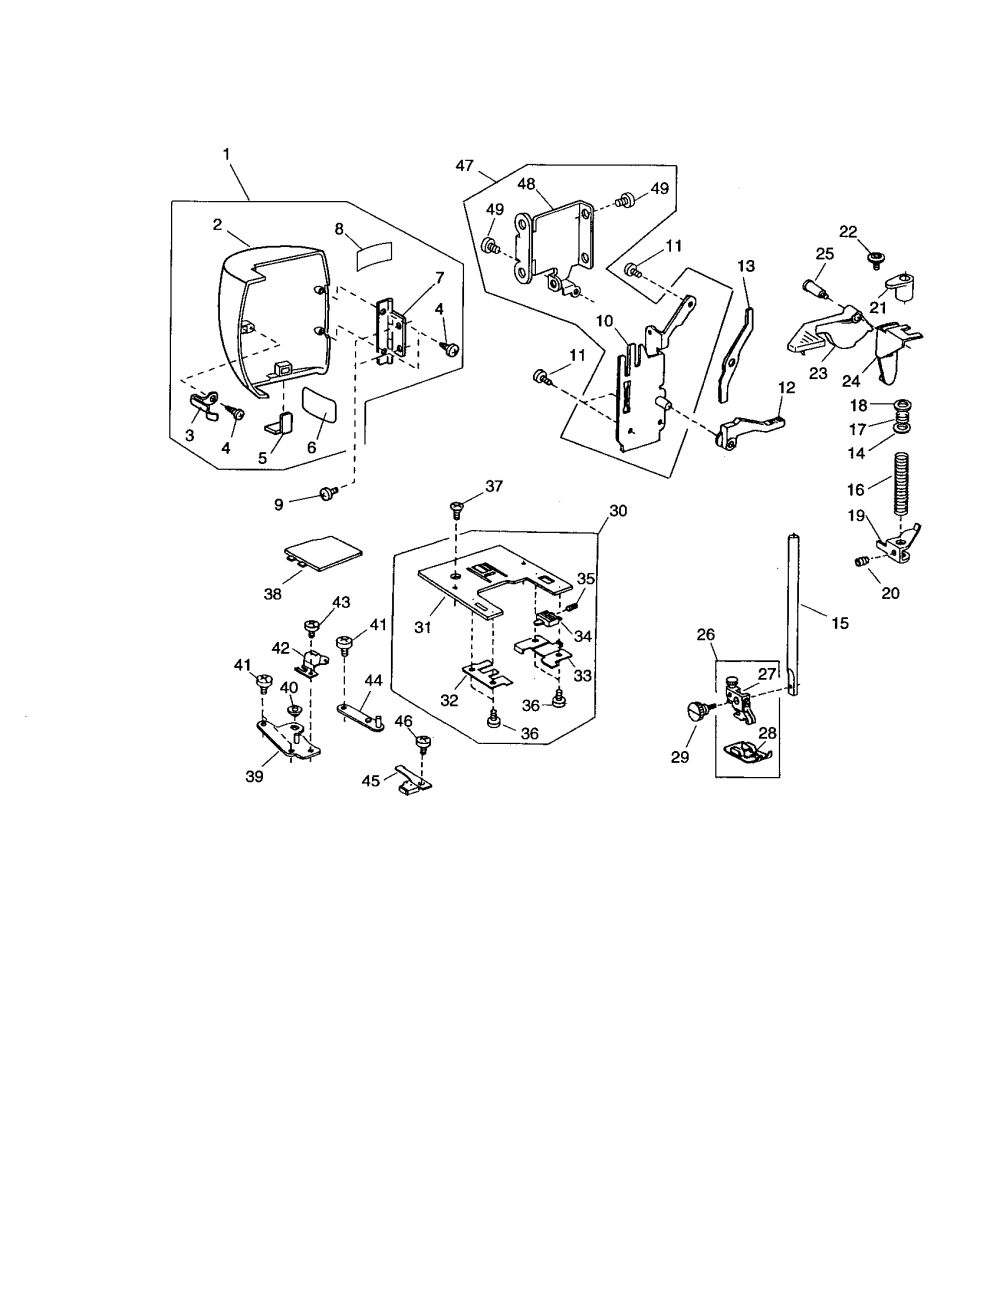 medium resolution of kenmore 38516221300 face cover presser base plate diagram